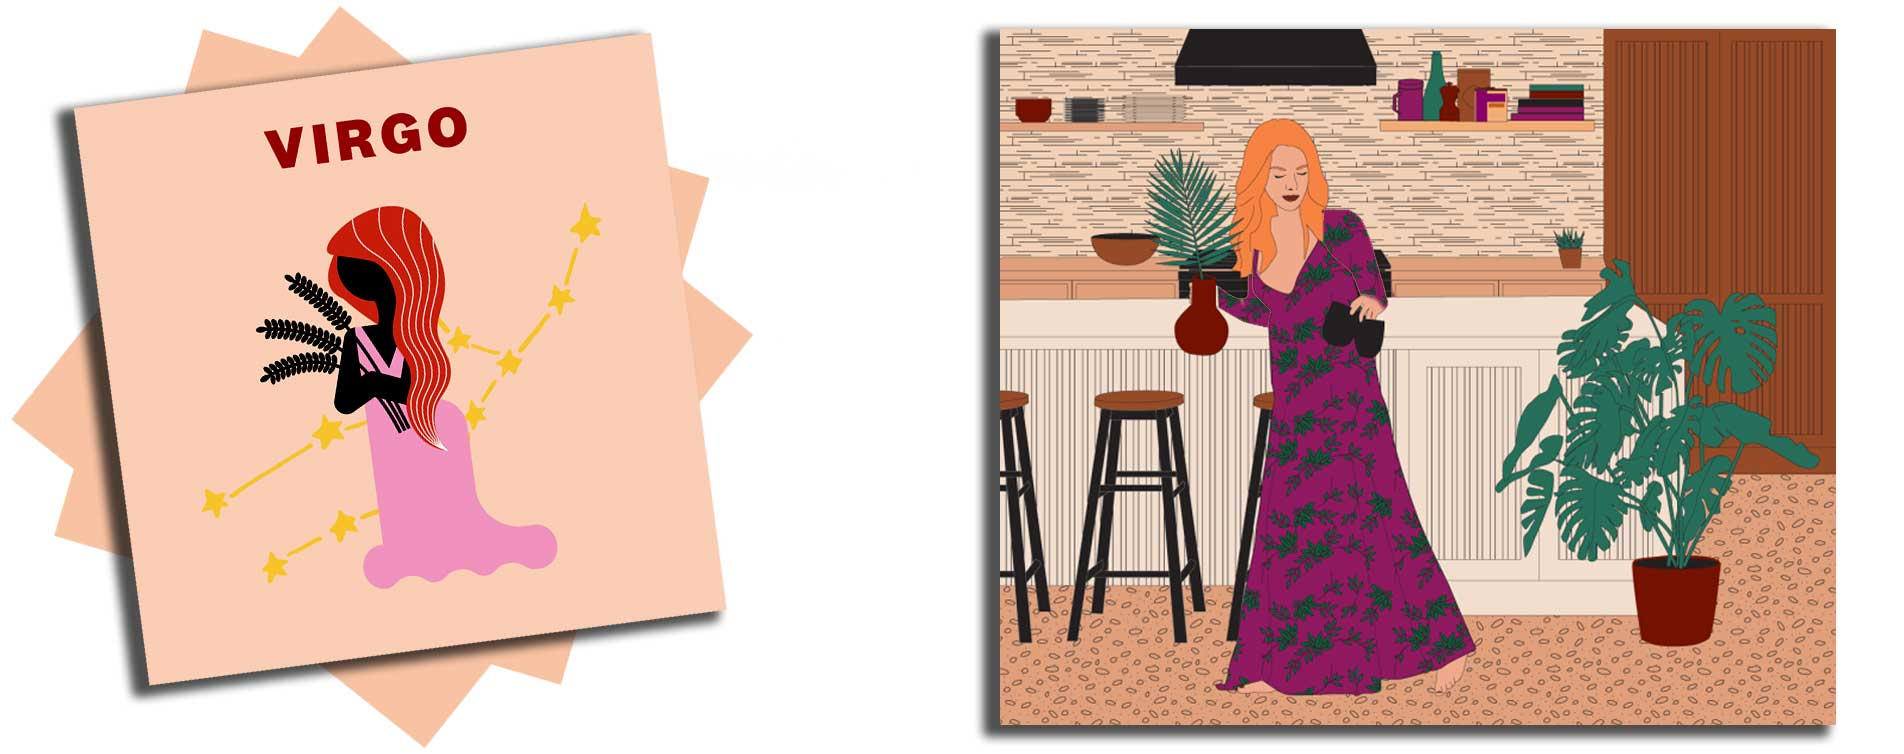 Design Your Home Based  Your Astrological Sign 12 - دکوراسیون ماه تولد : ایده های چیدمان بر اساس نشان ماه تولد شما